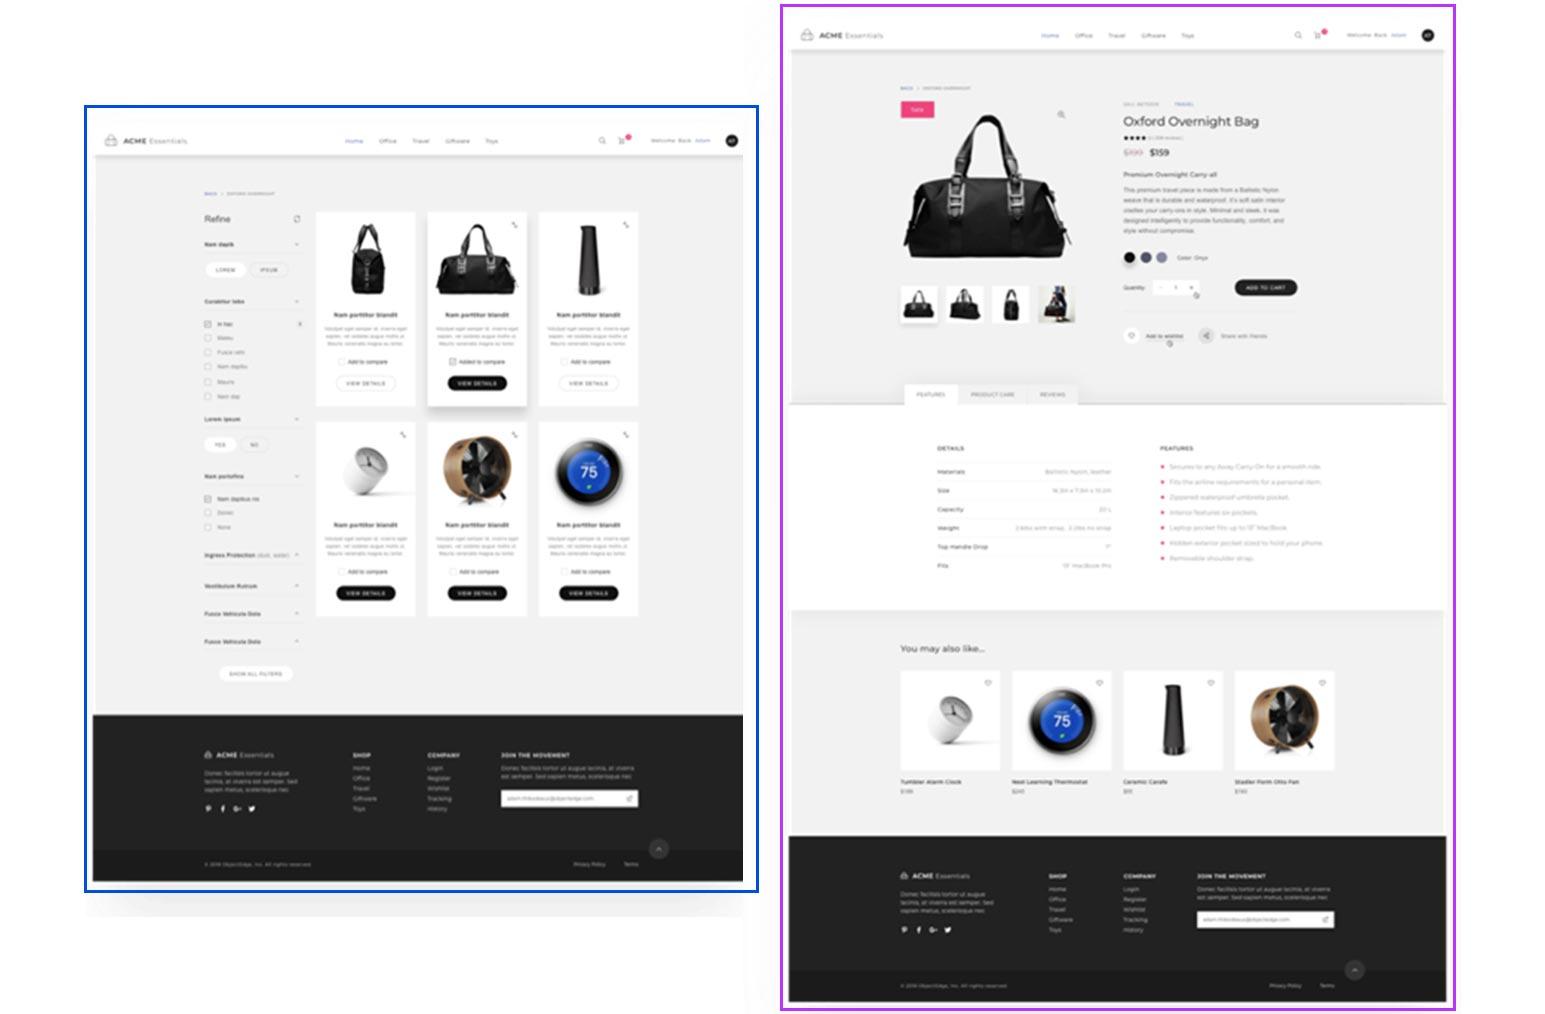 Web Design System - Final Website Page Layout